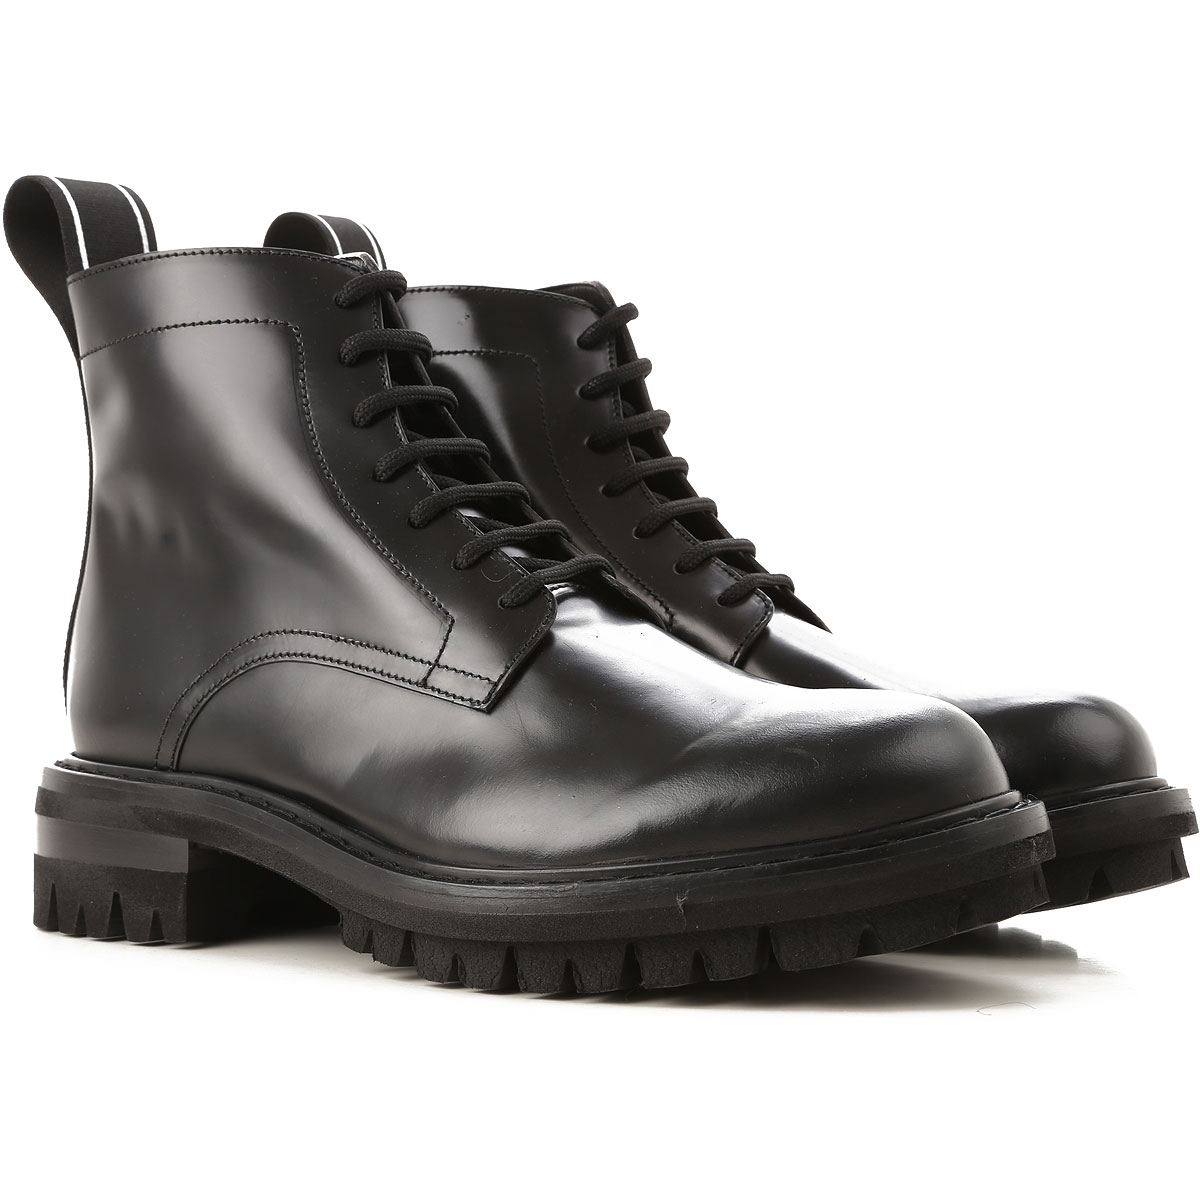 986656a66e2e1a Mens Shoes Dsquared2, Style code: abm0025-24901027-2124